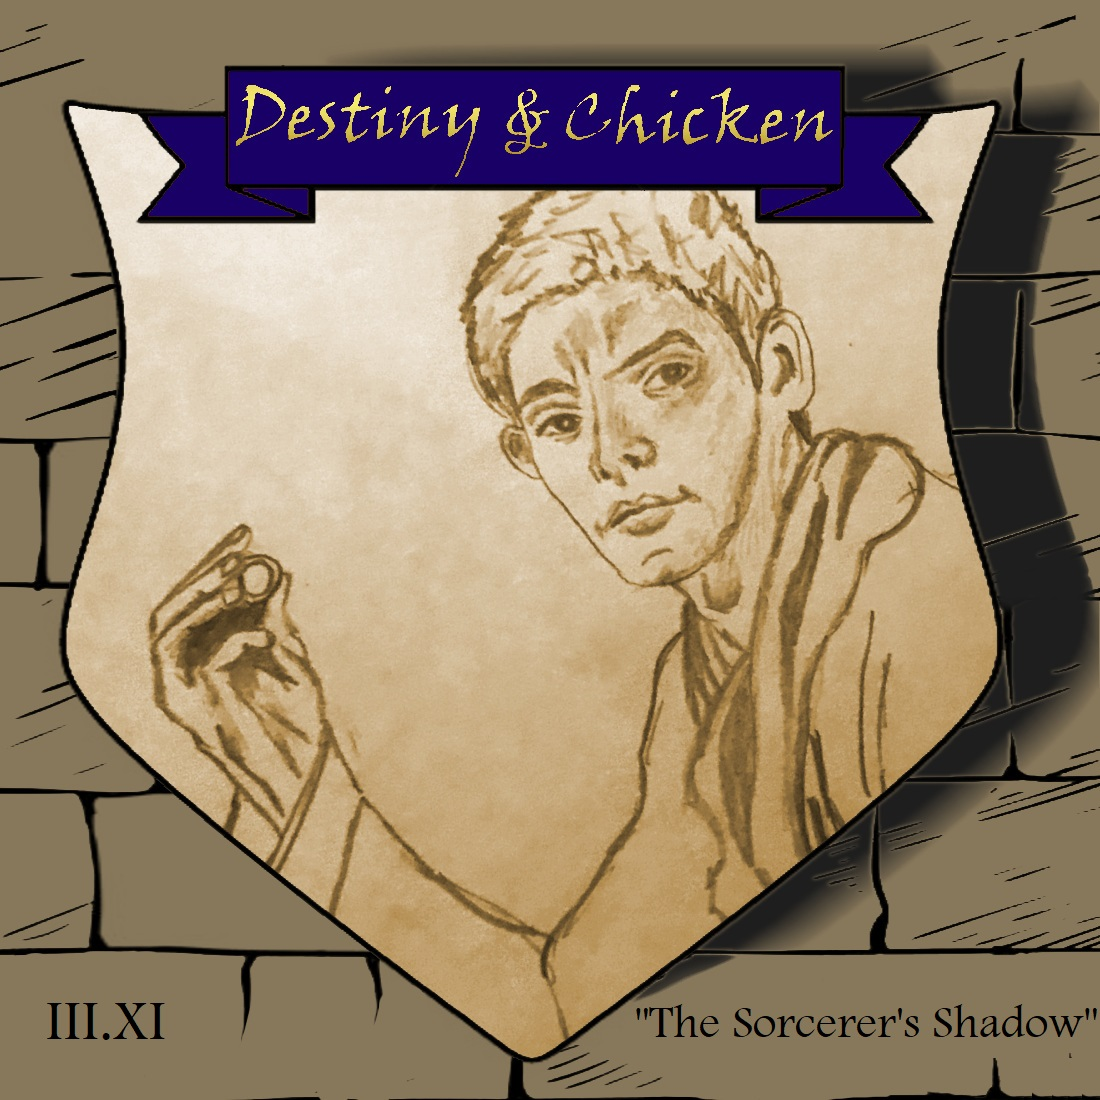 Episode III.XI - The Sorcerer's Shadow